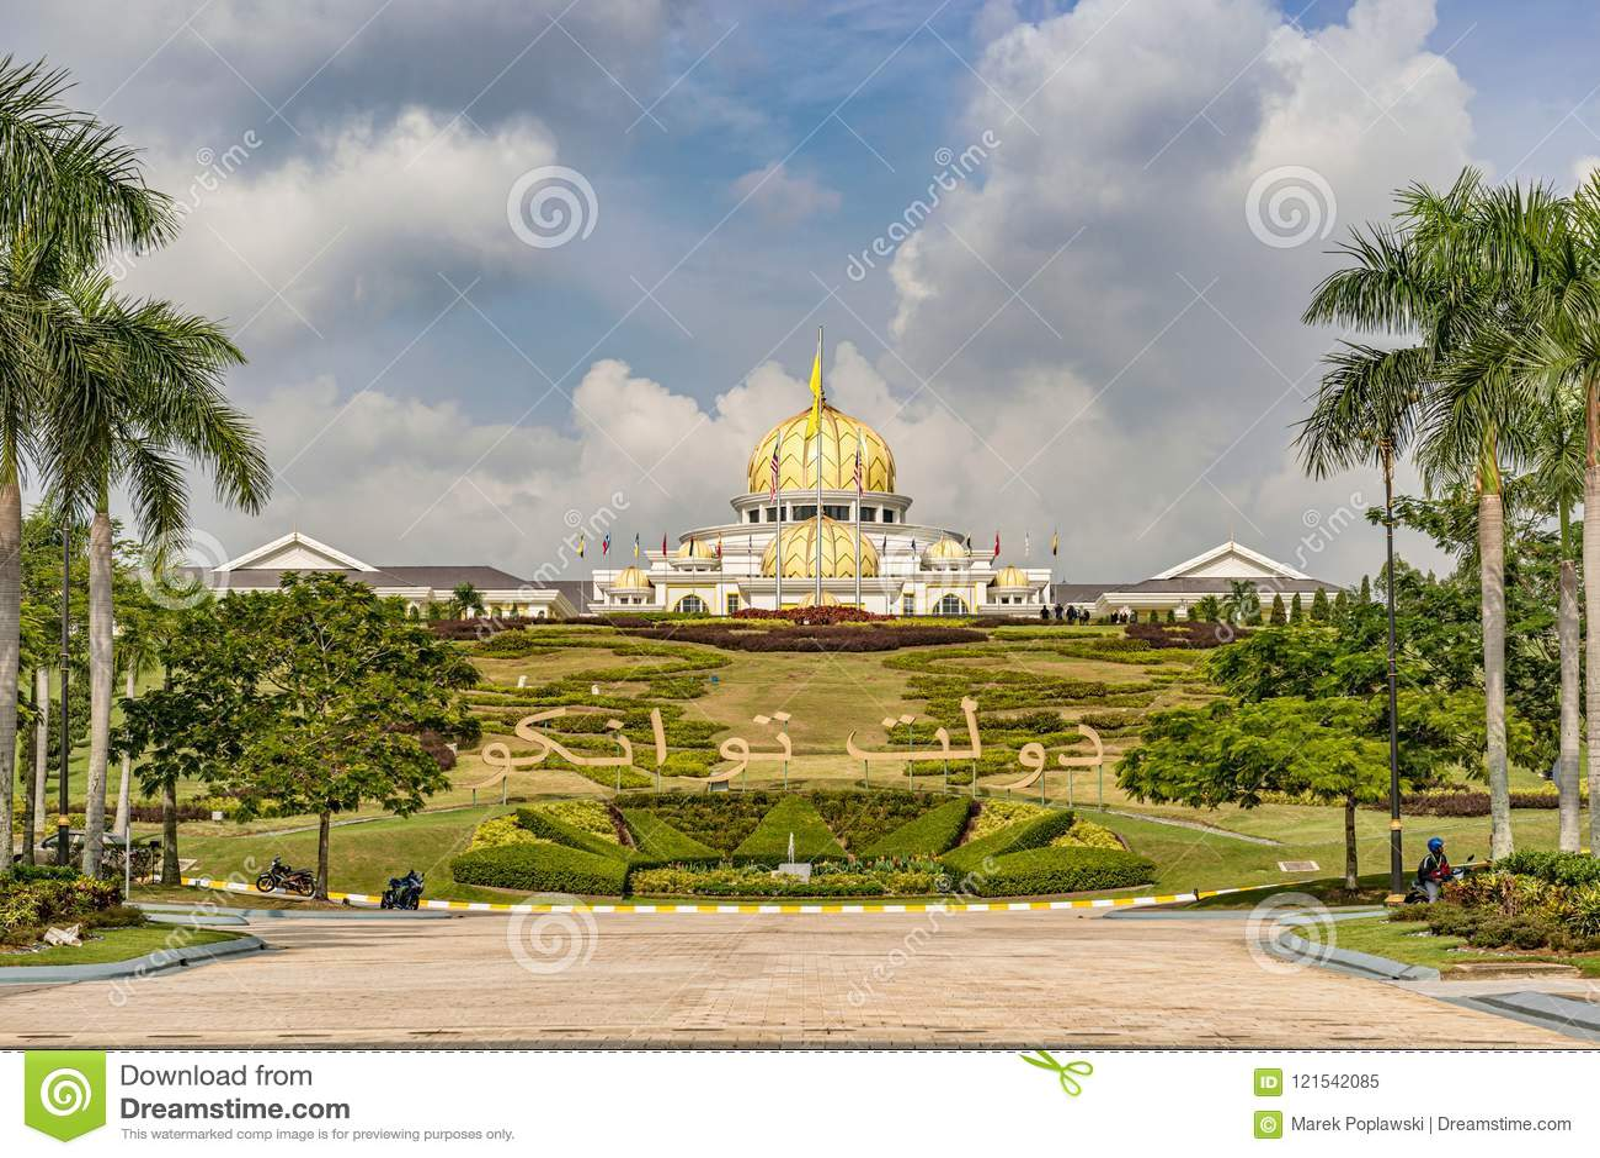 Nya Royal Palace Istana Negara i Kuala Lumpur, Malaysia